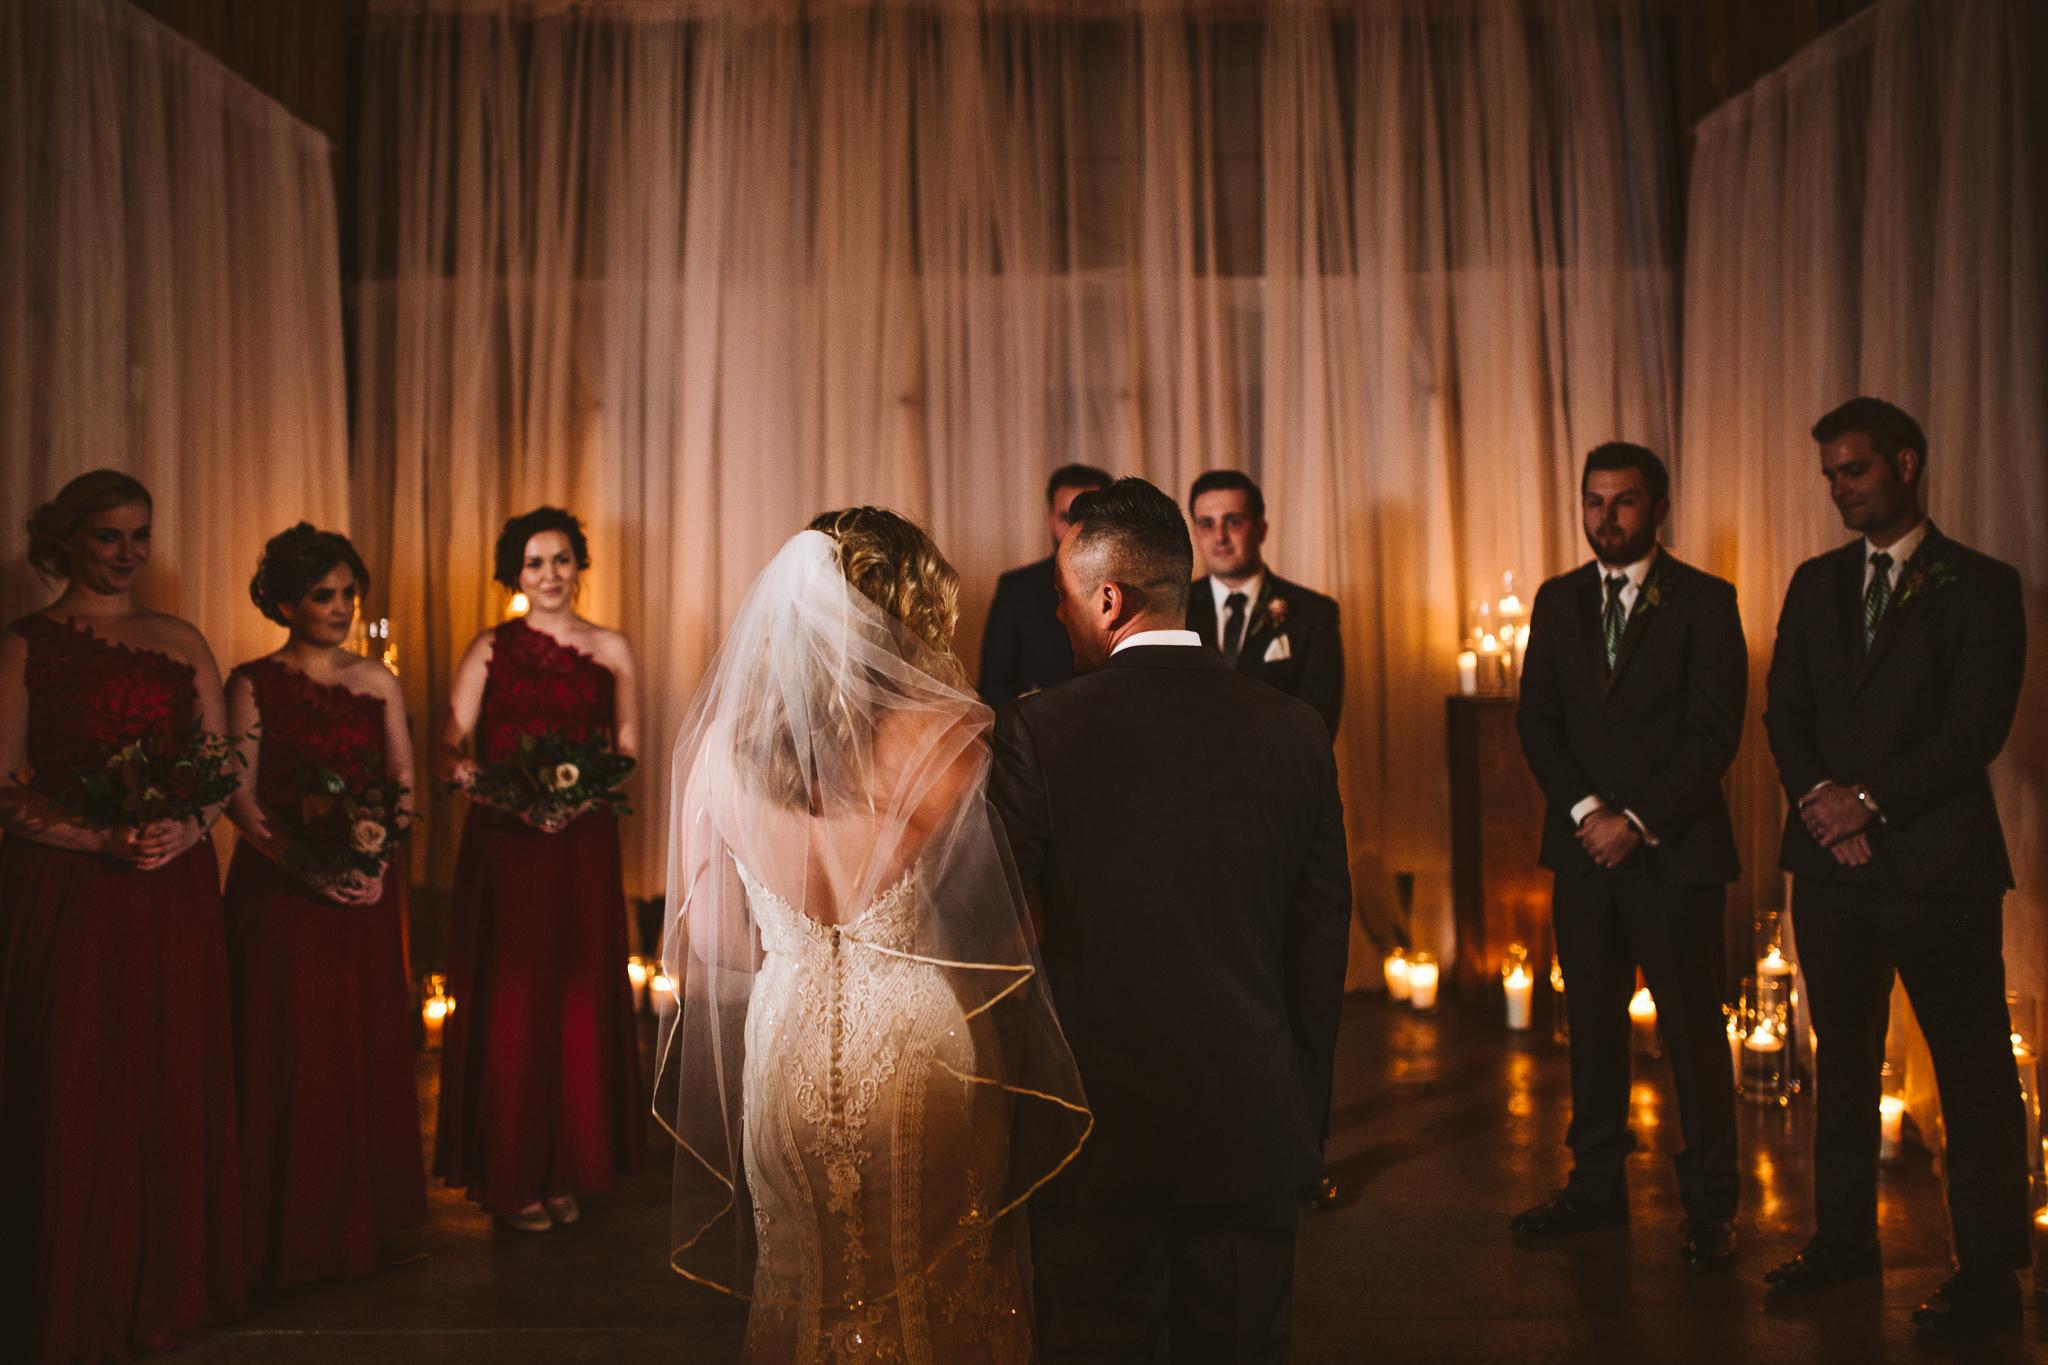 0119 Ariana Jordan Photo - Cameron & Lauren's Wedding at Talon Winery  7003.jpg